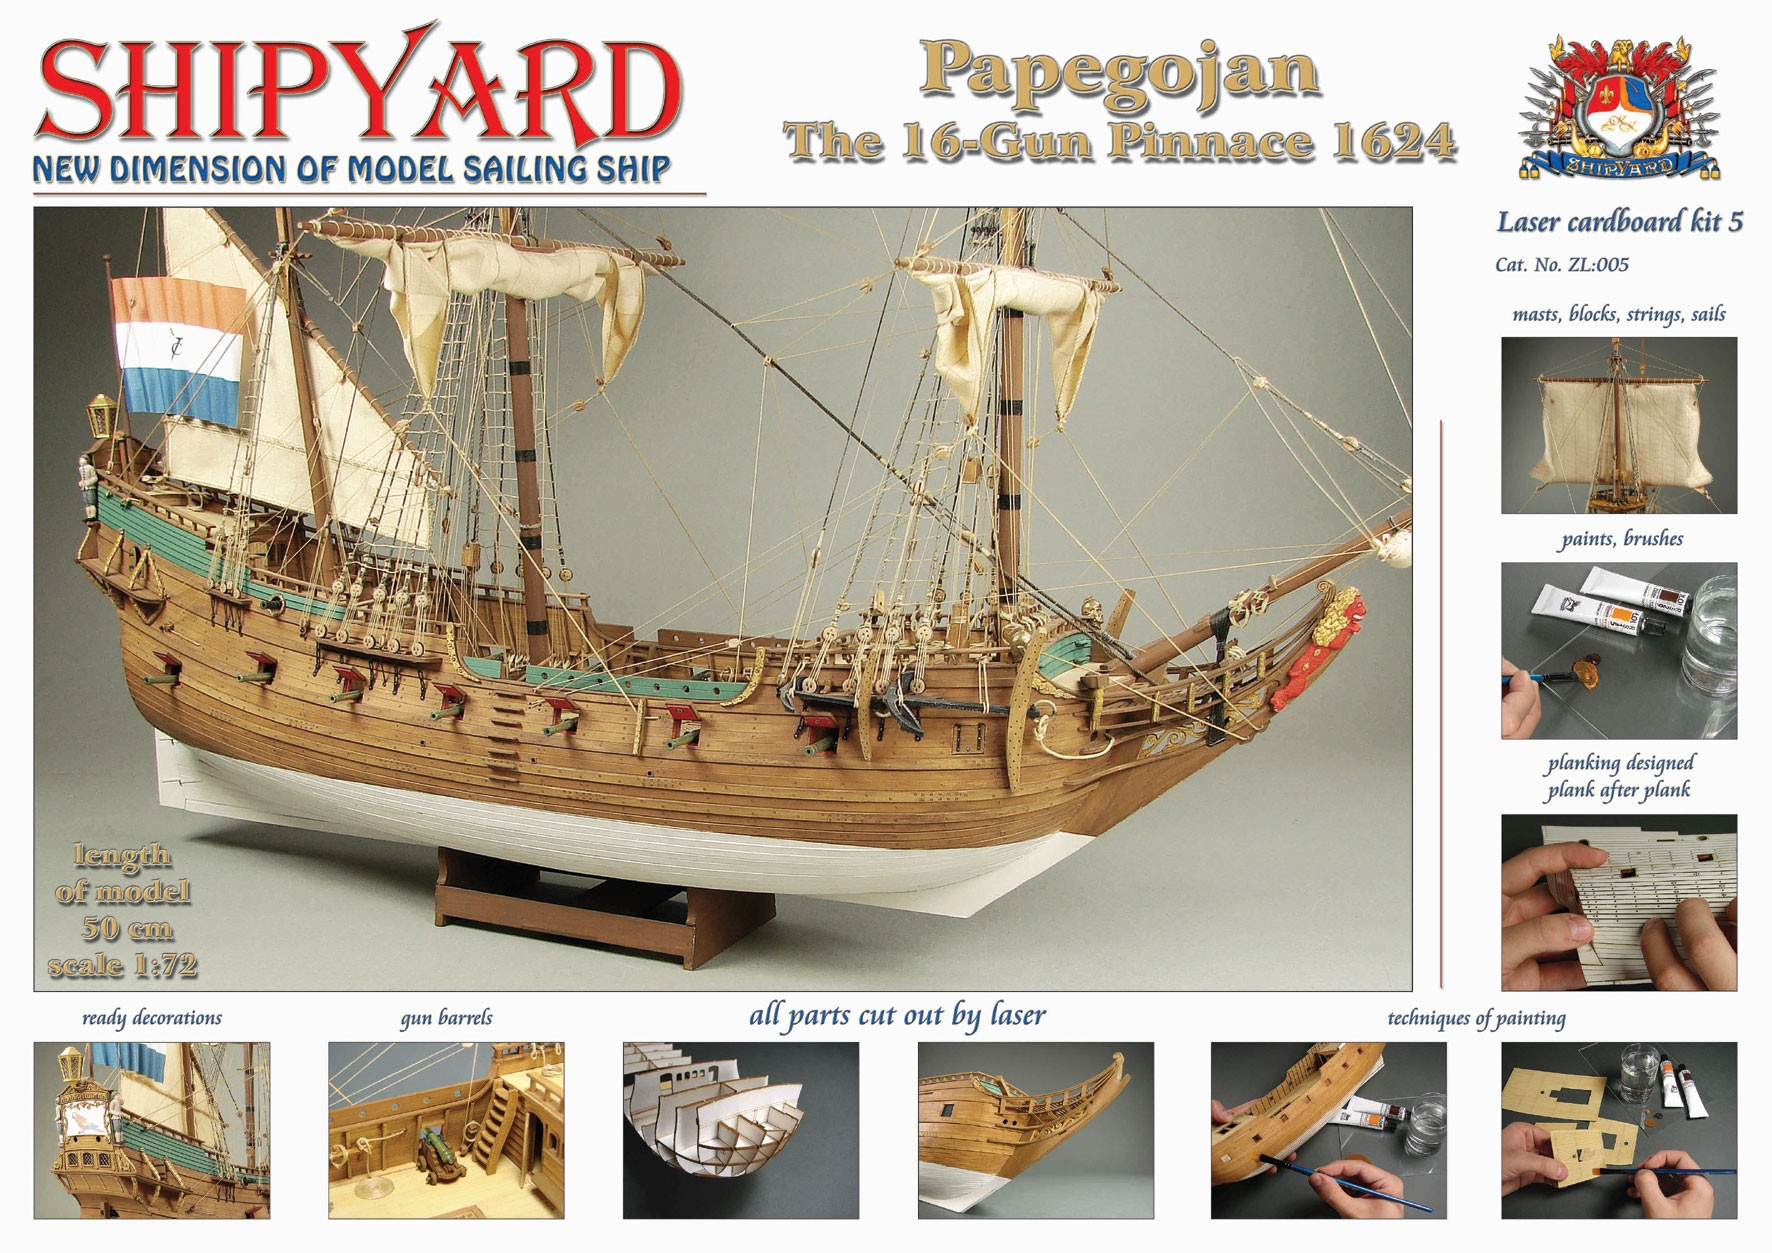 Papegojan Laser Cardboard Kit (Shipyard 1:72)